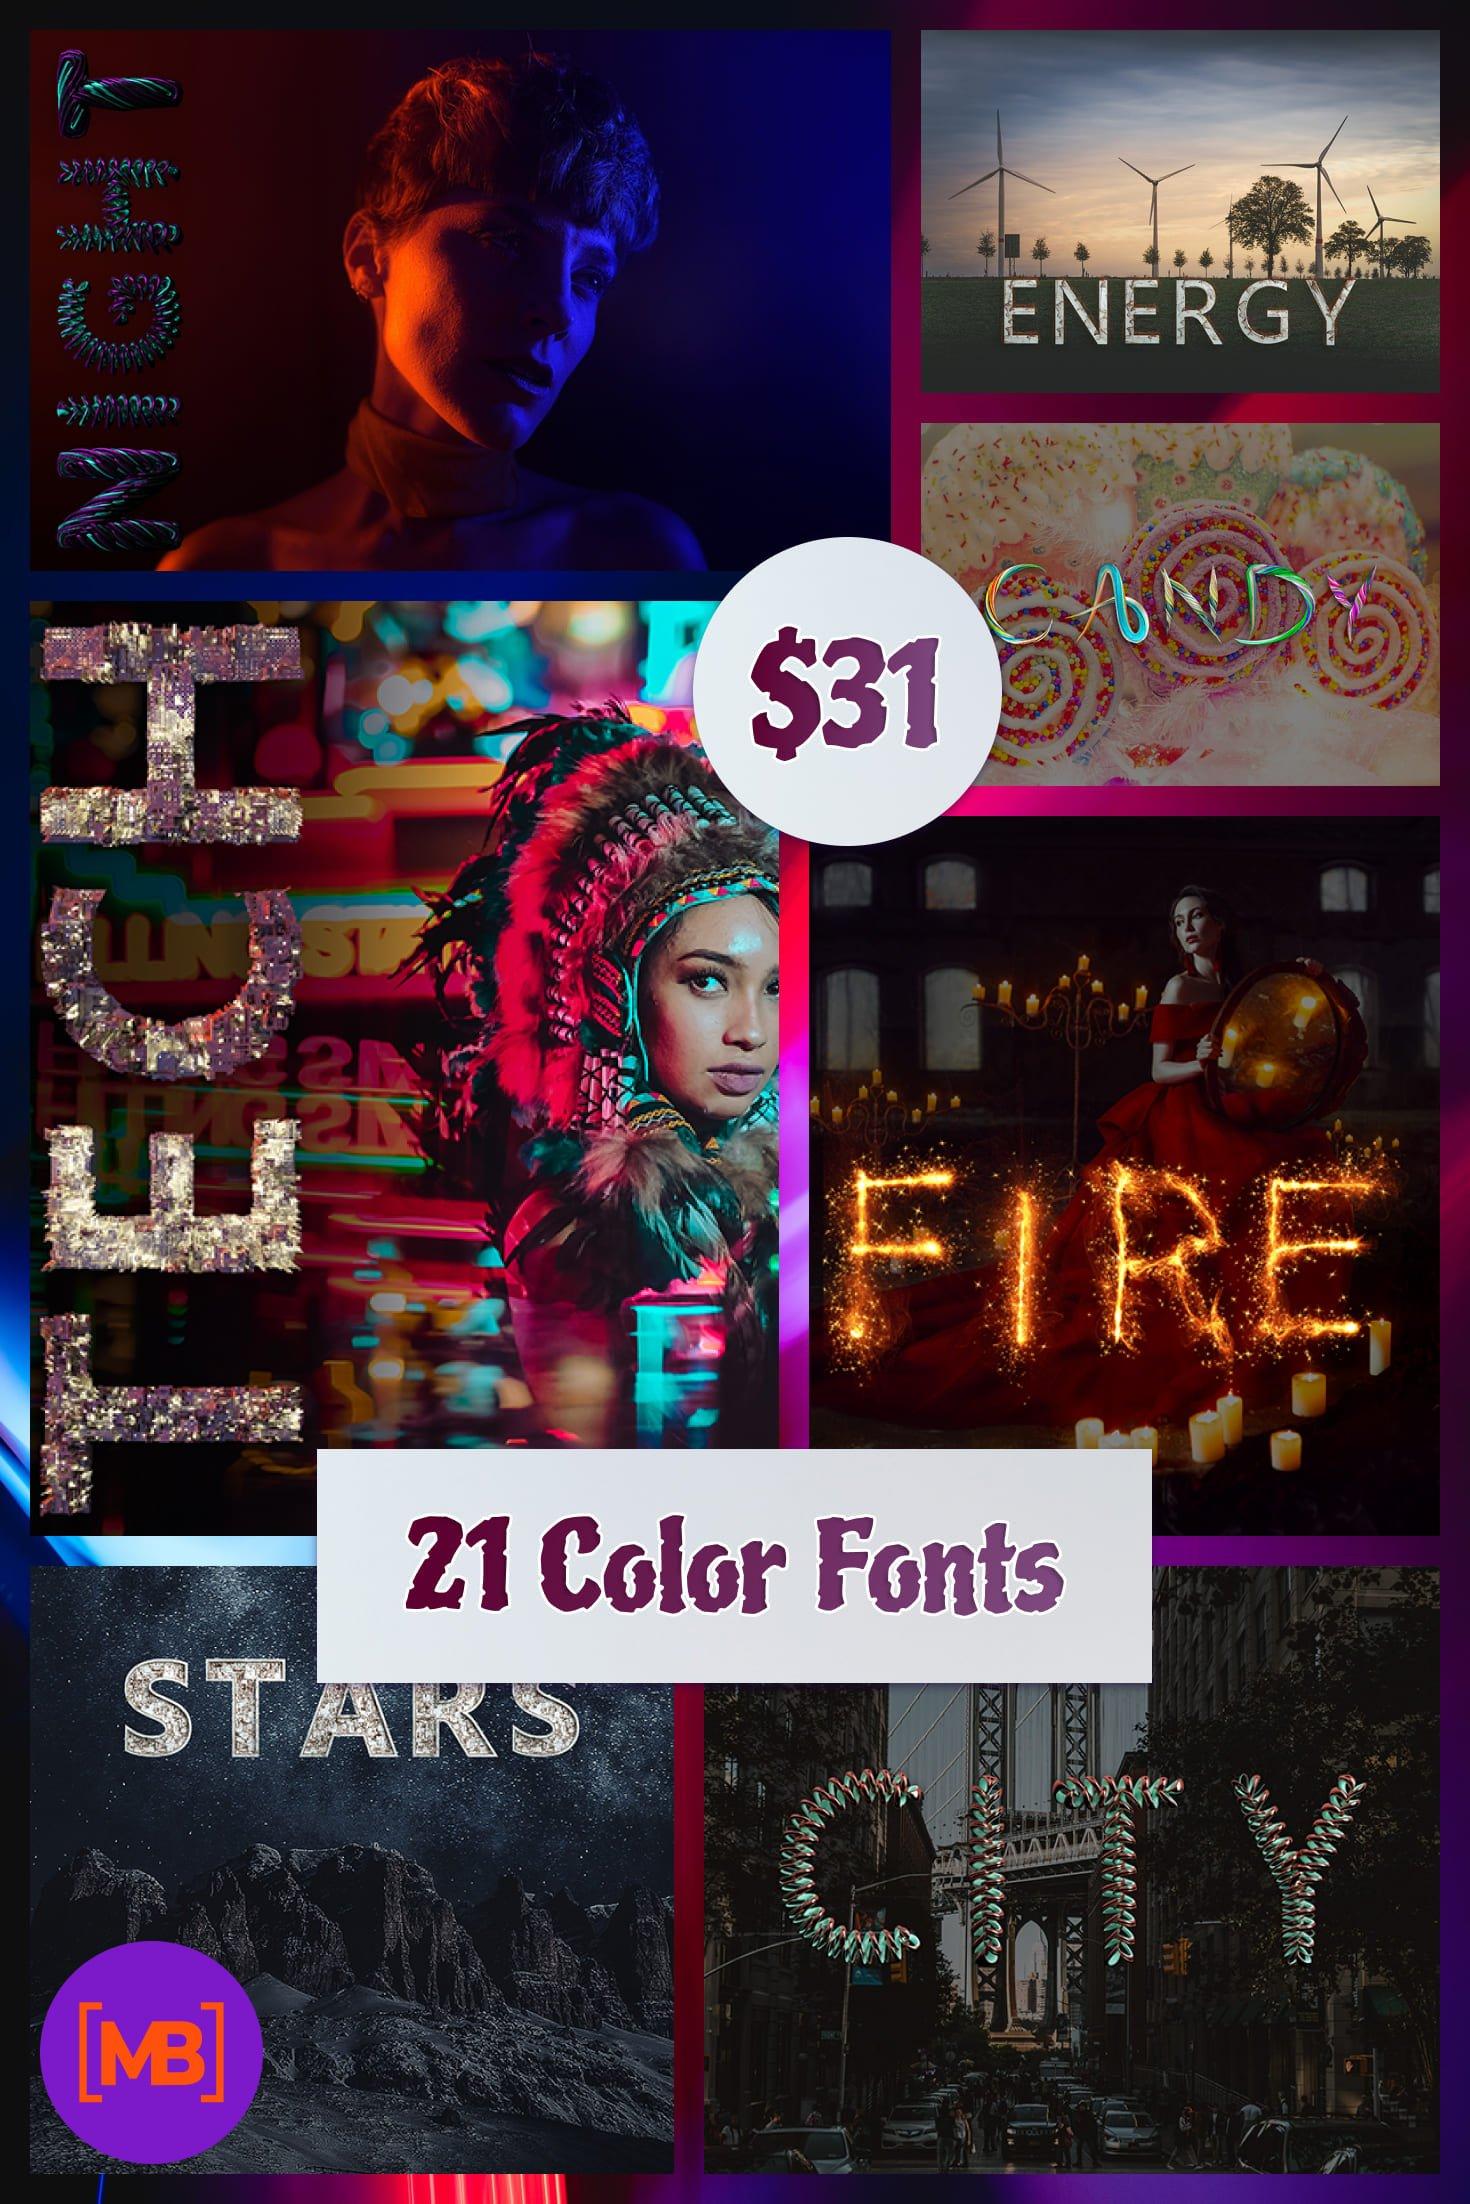 21 Color Fonts: FaeryDesign & PandoraDreams Render Fonts. Collage Image.